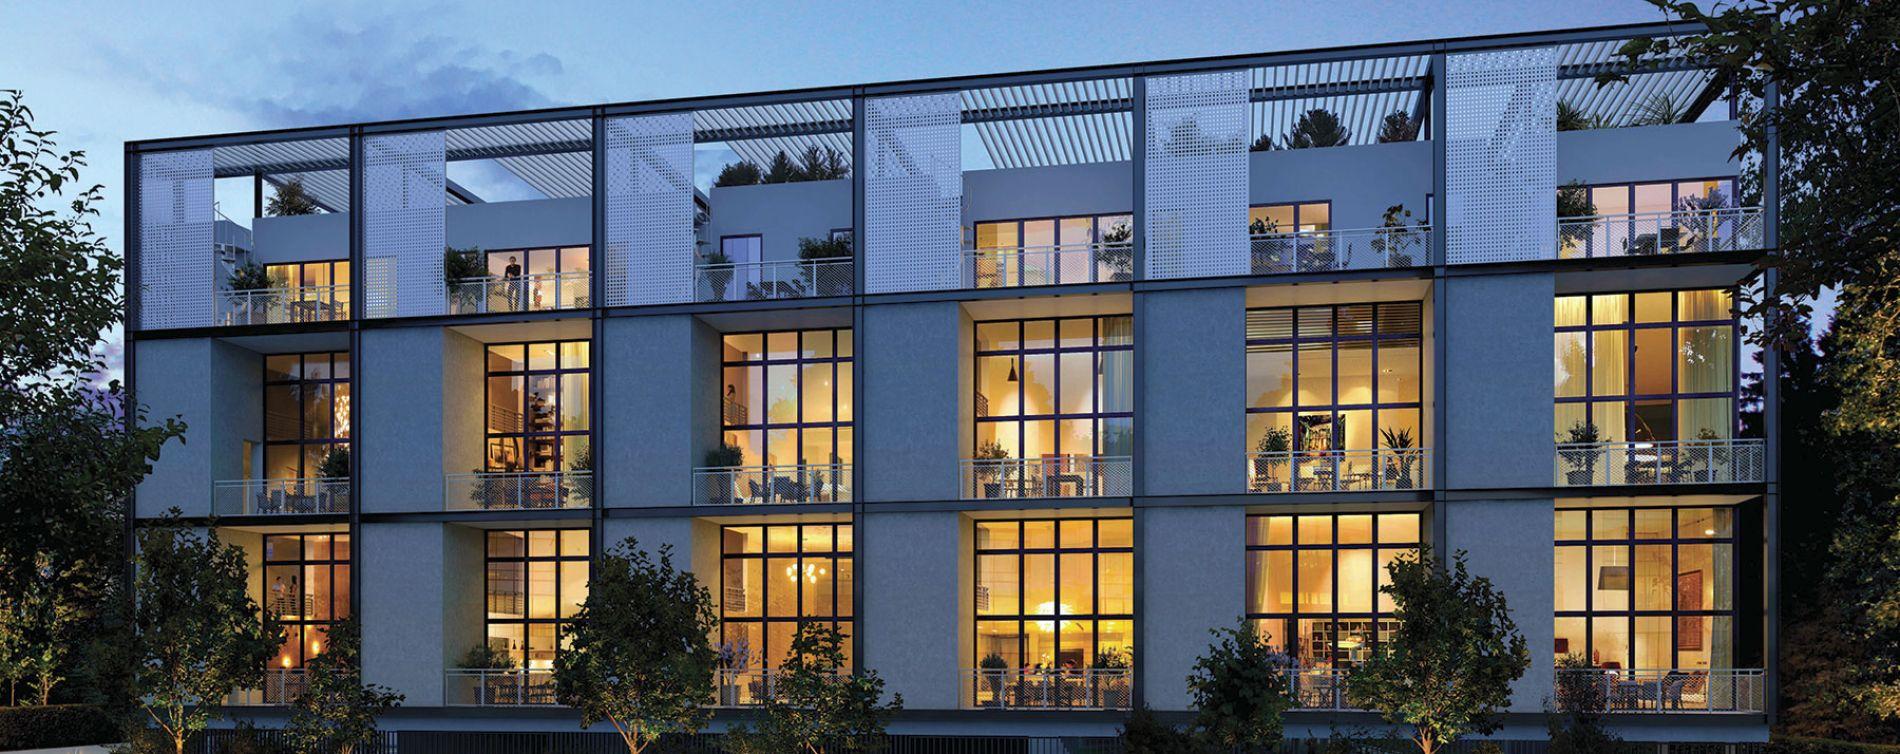 Résidence Atelier Arles à Arles